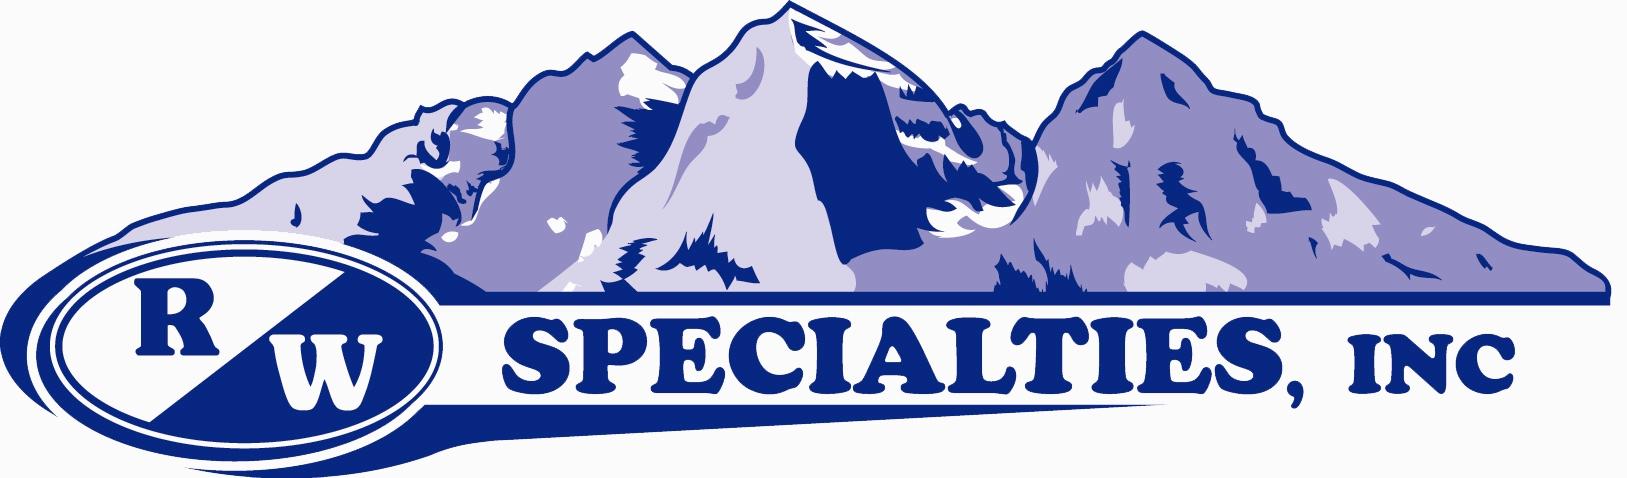 RW Specialties